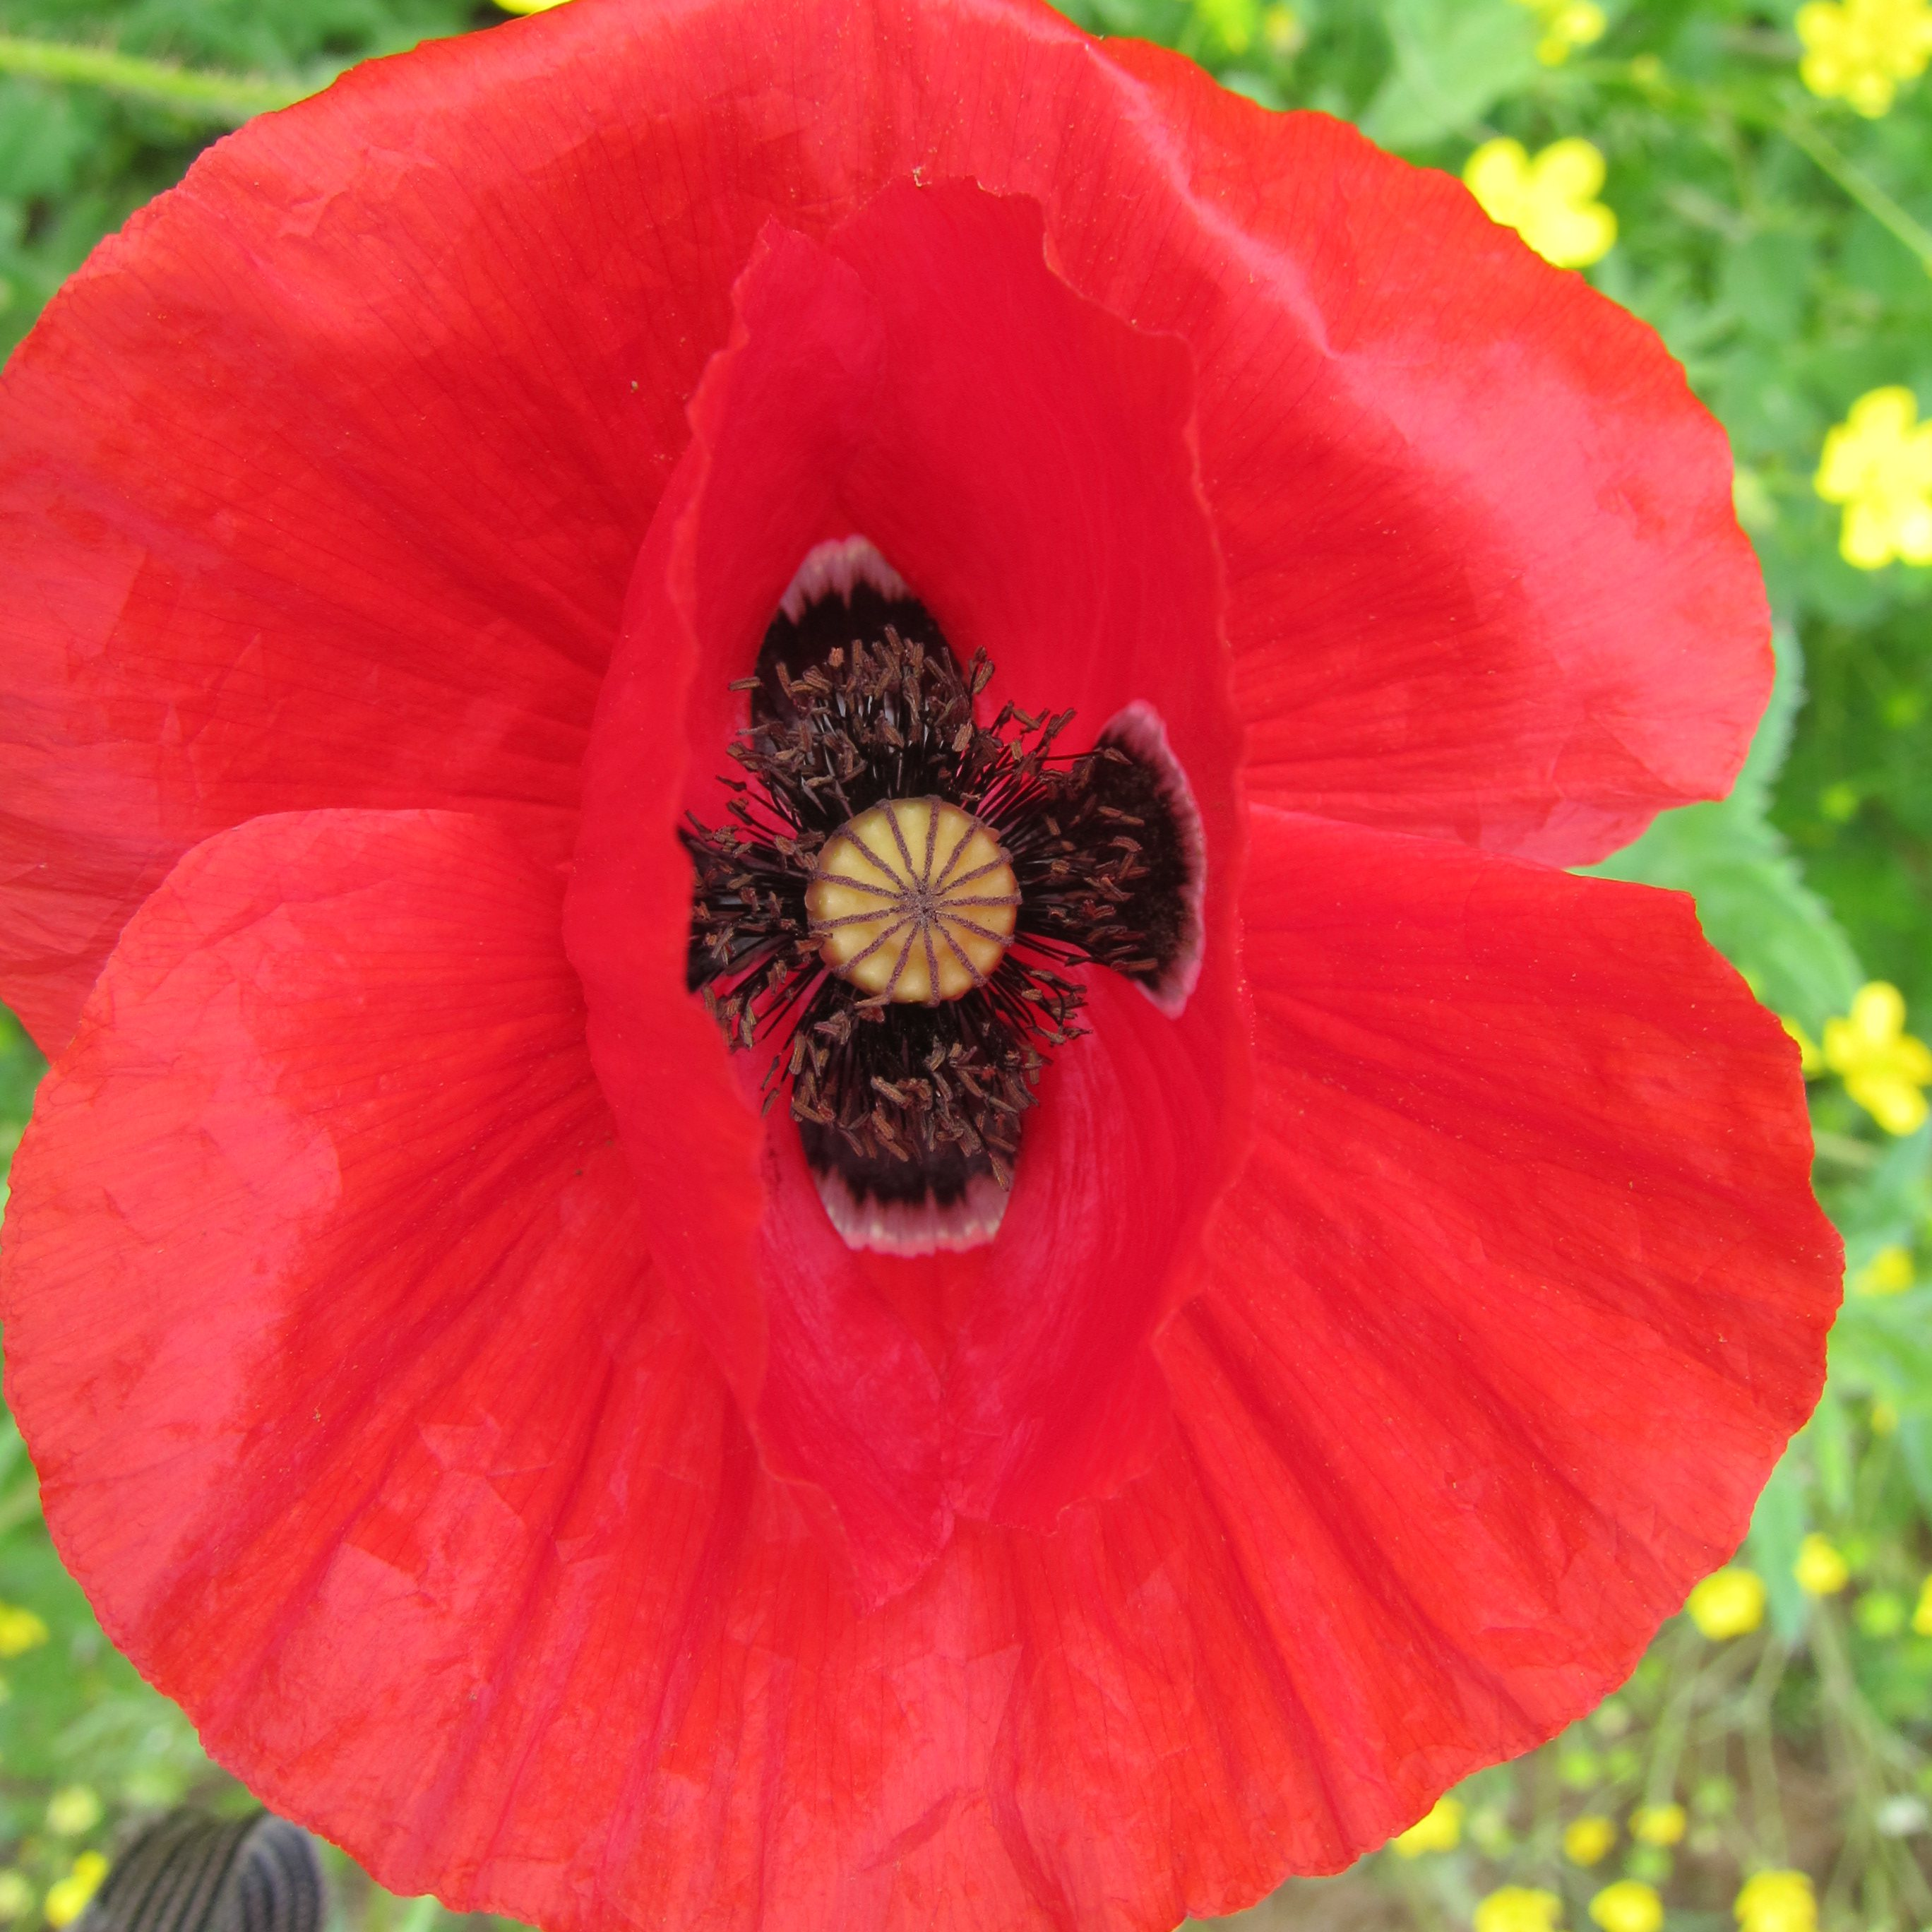 Klatschmohn, Blütenblätter, Wildsammlung